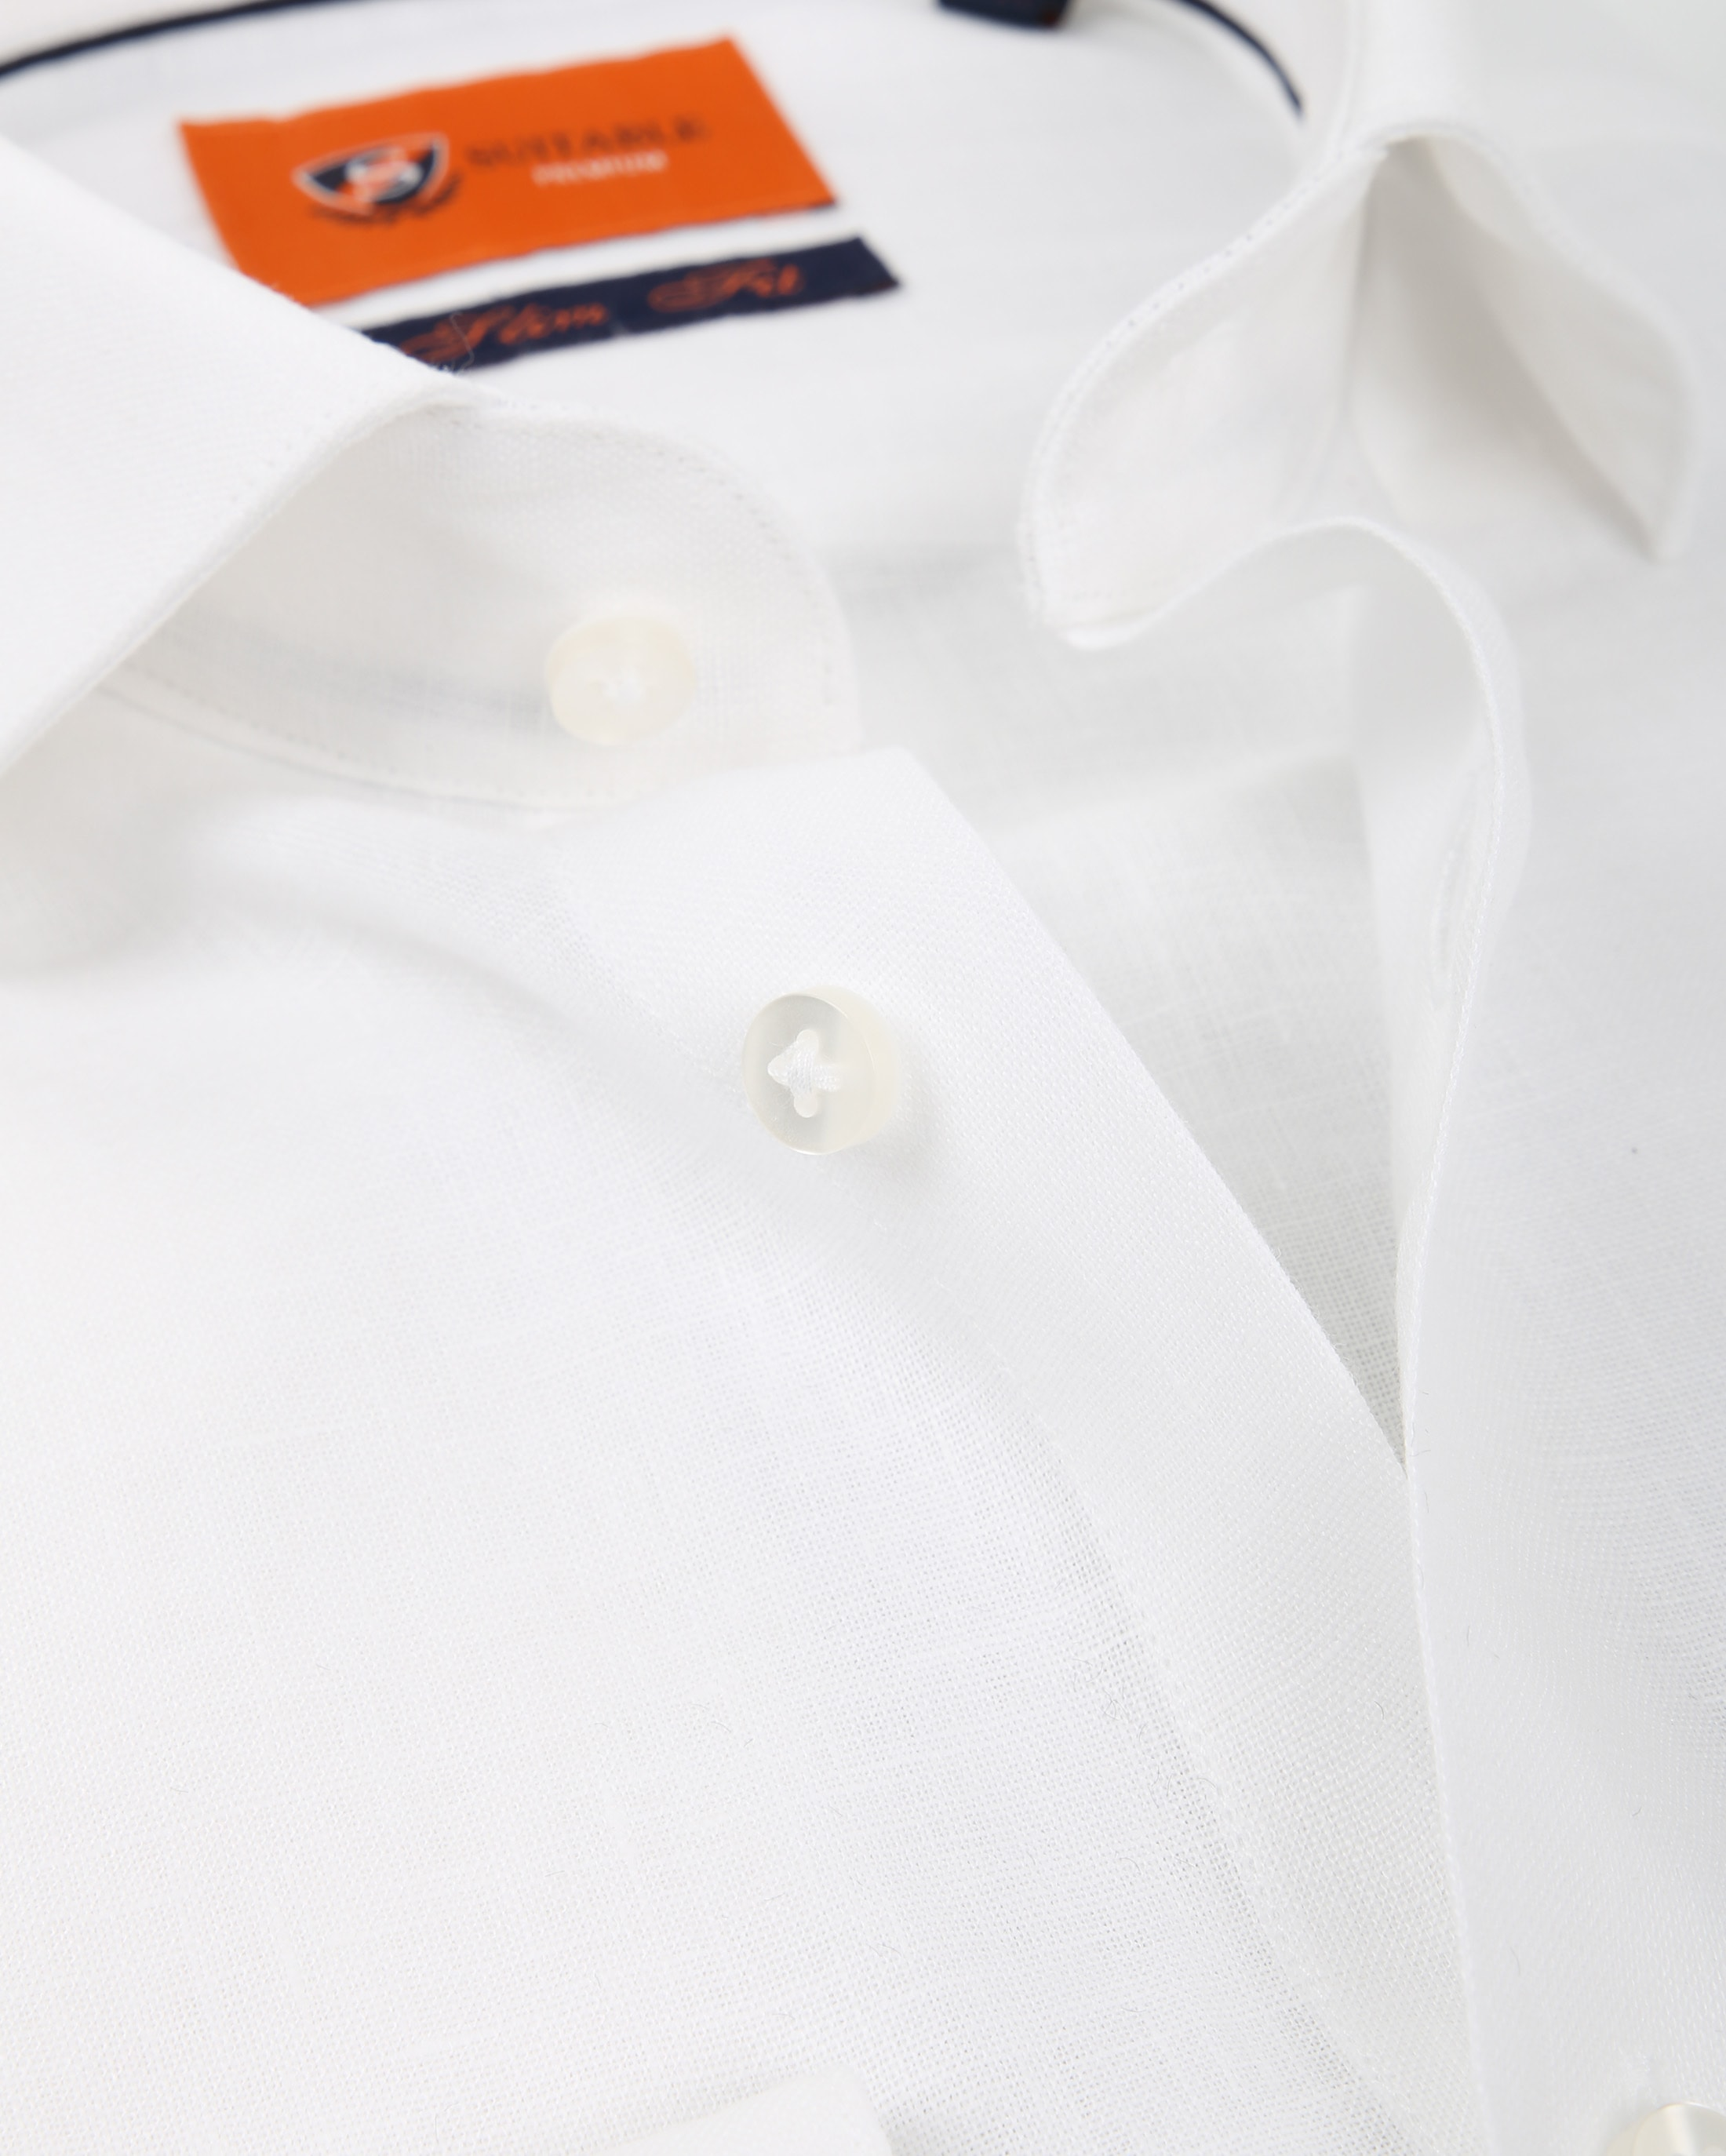 Suitable Hemd Leinen Weiß D81-13 foto 1